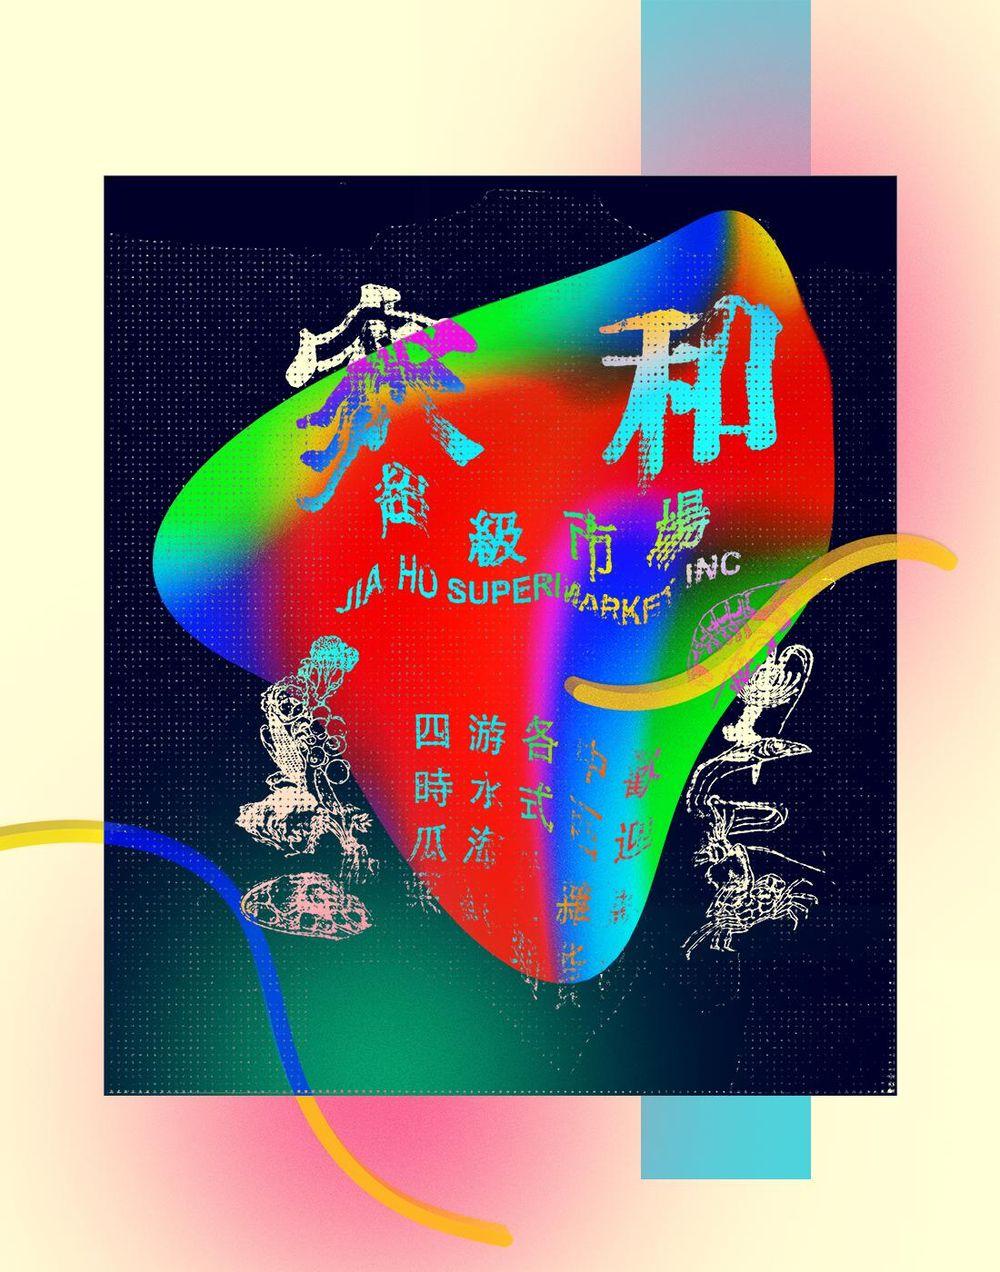 Jia Ho Supermarket Flyer - image 2 - student project